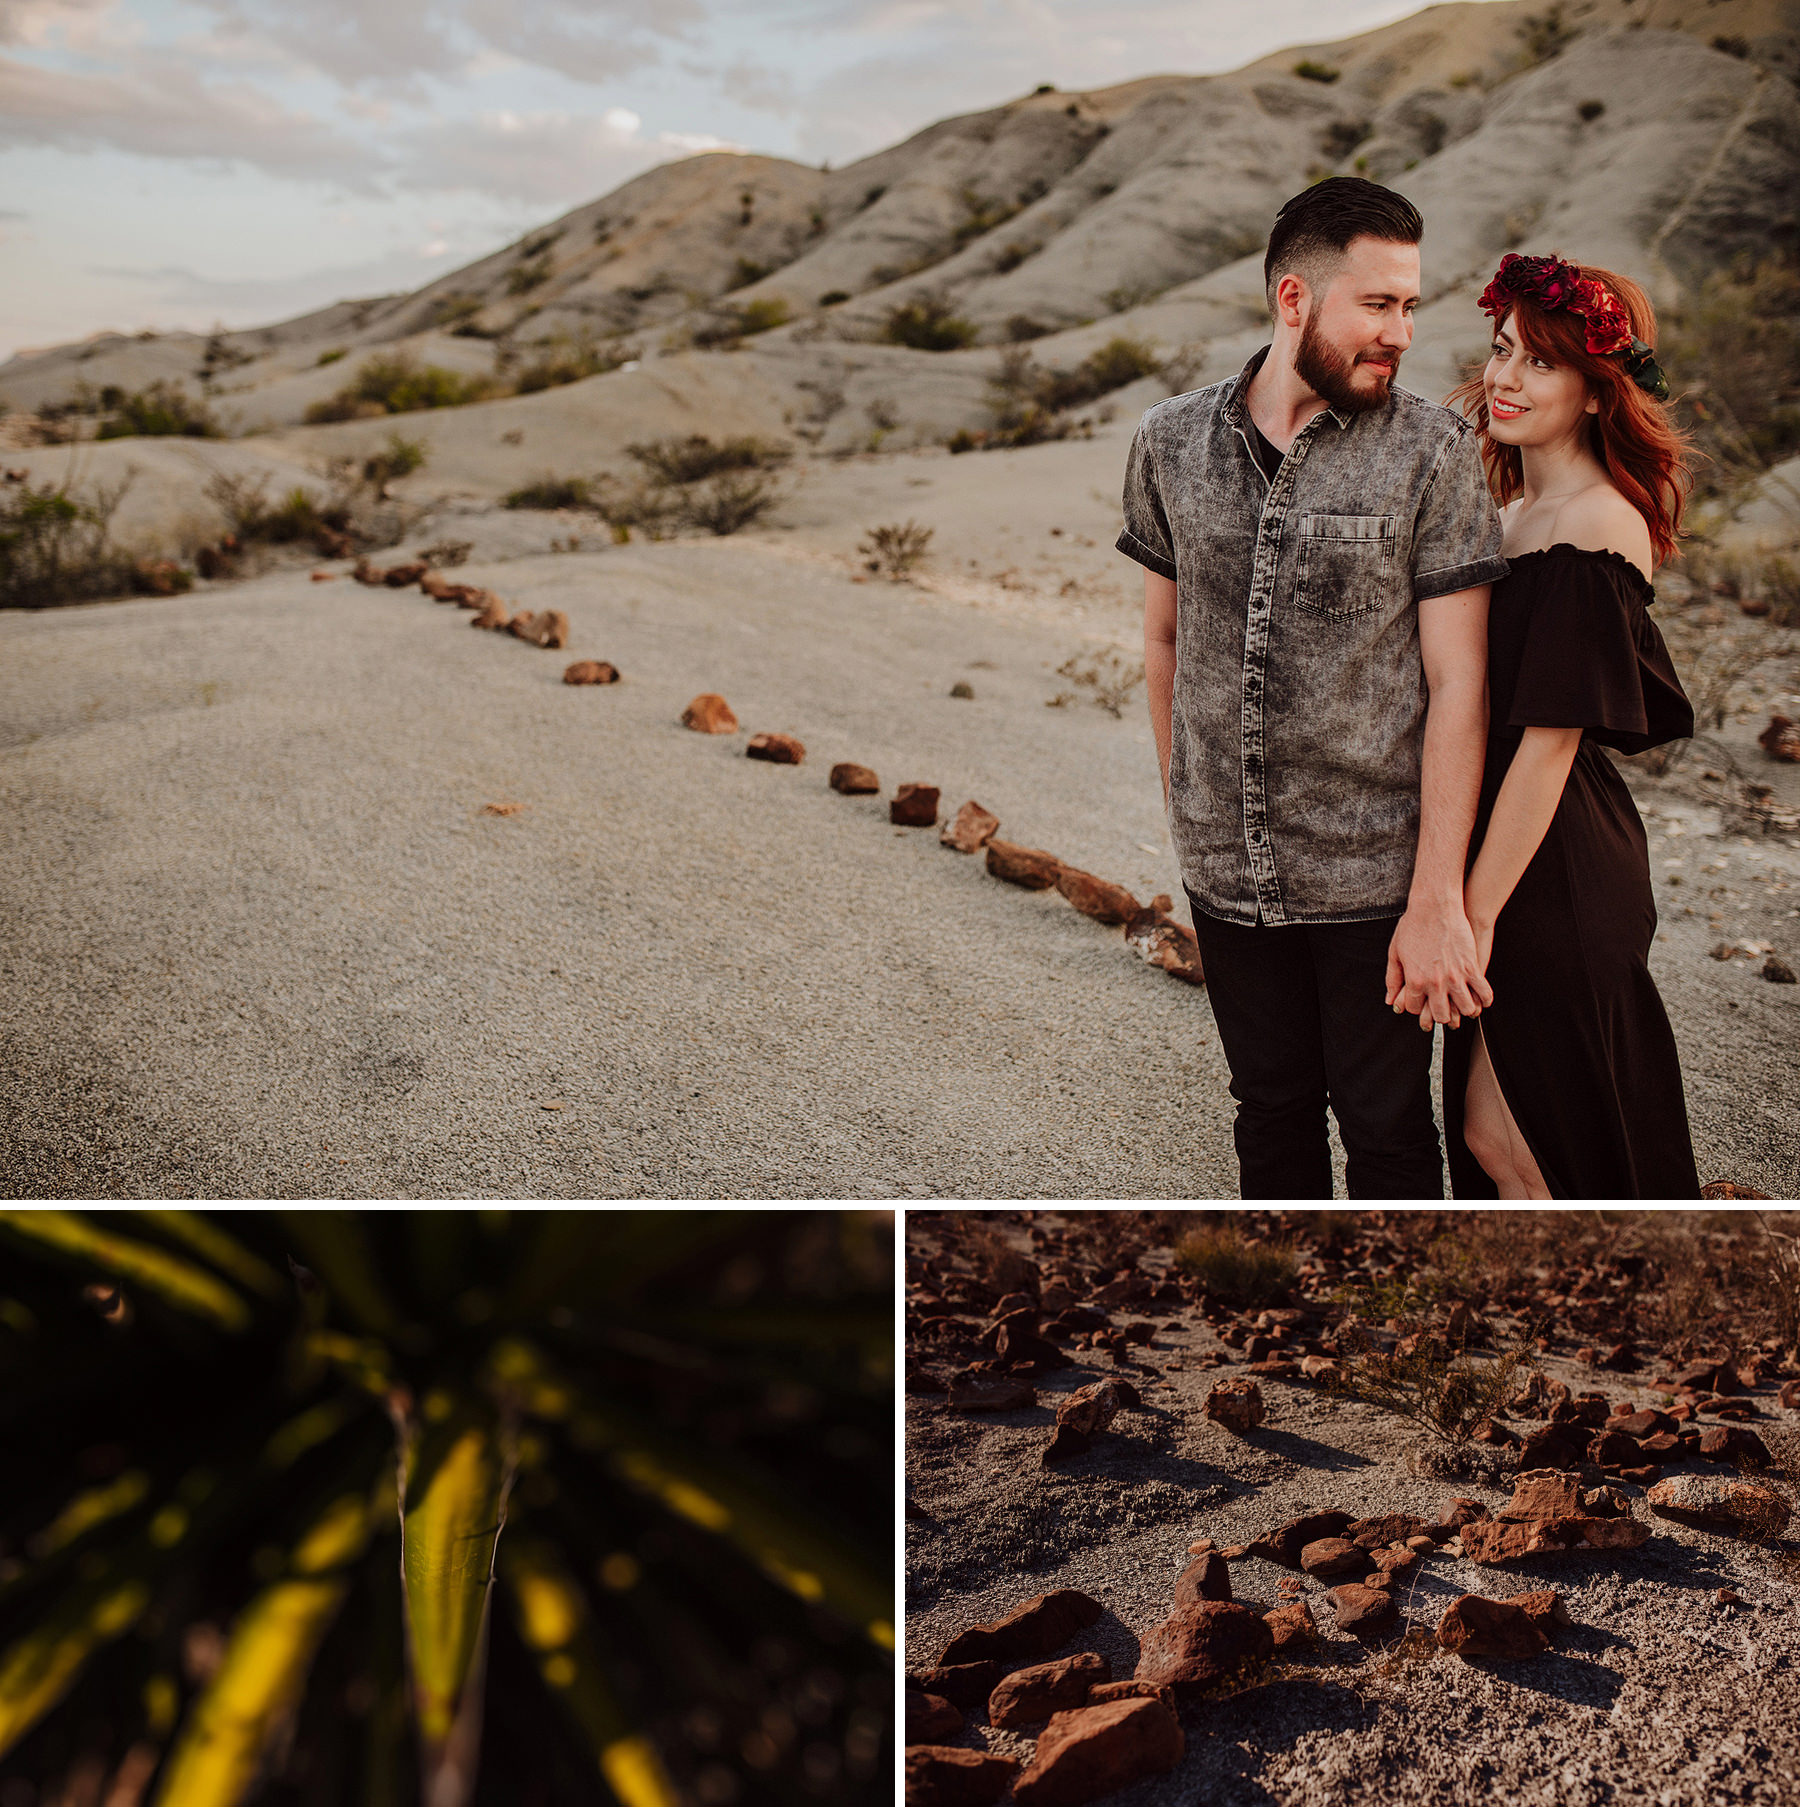 engagement session in the desert